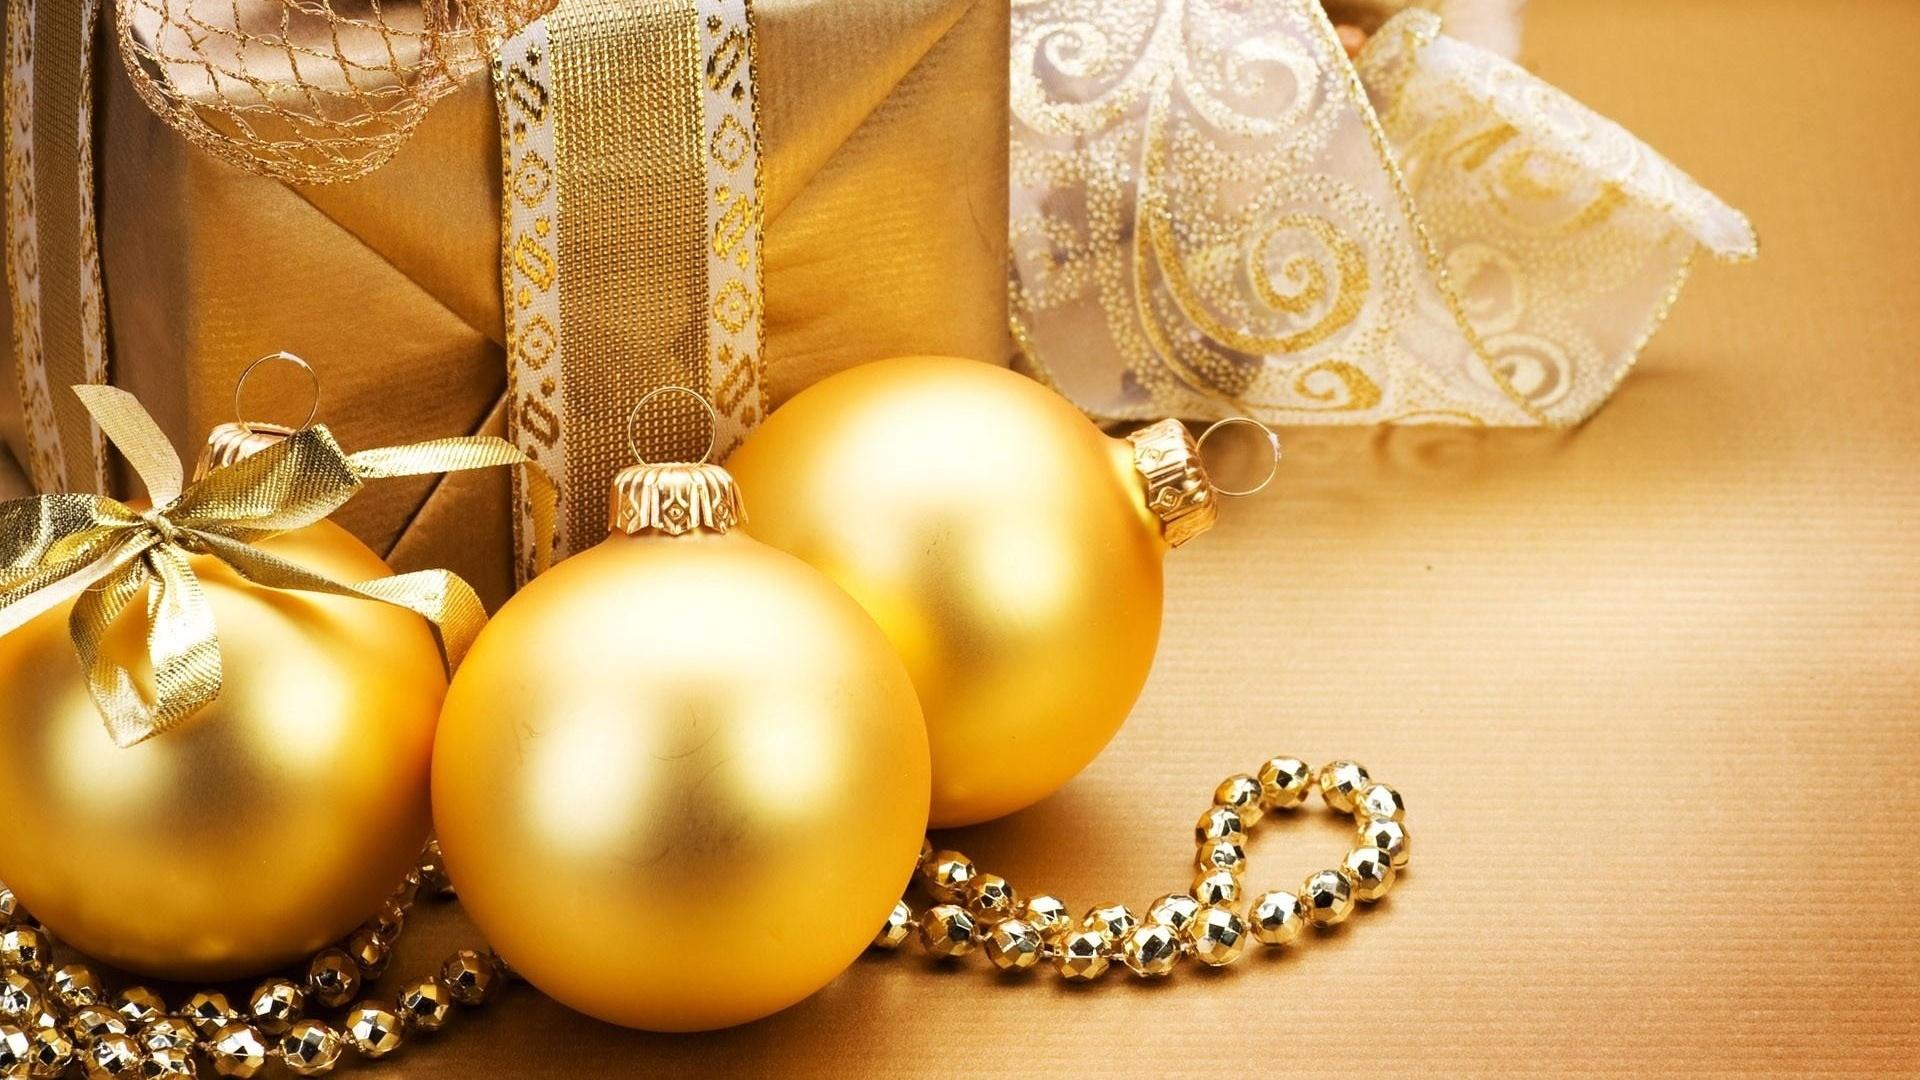 Christmas Gold HD Wallpaper